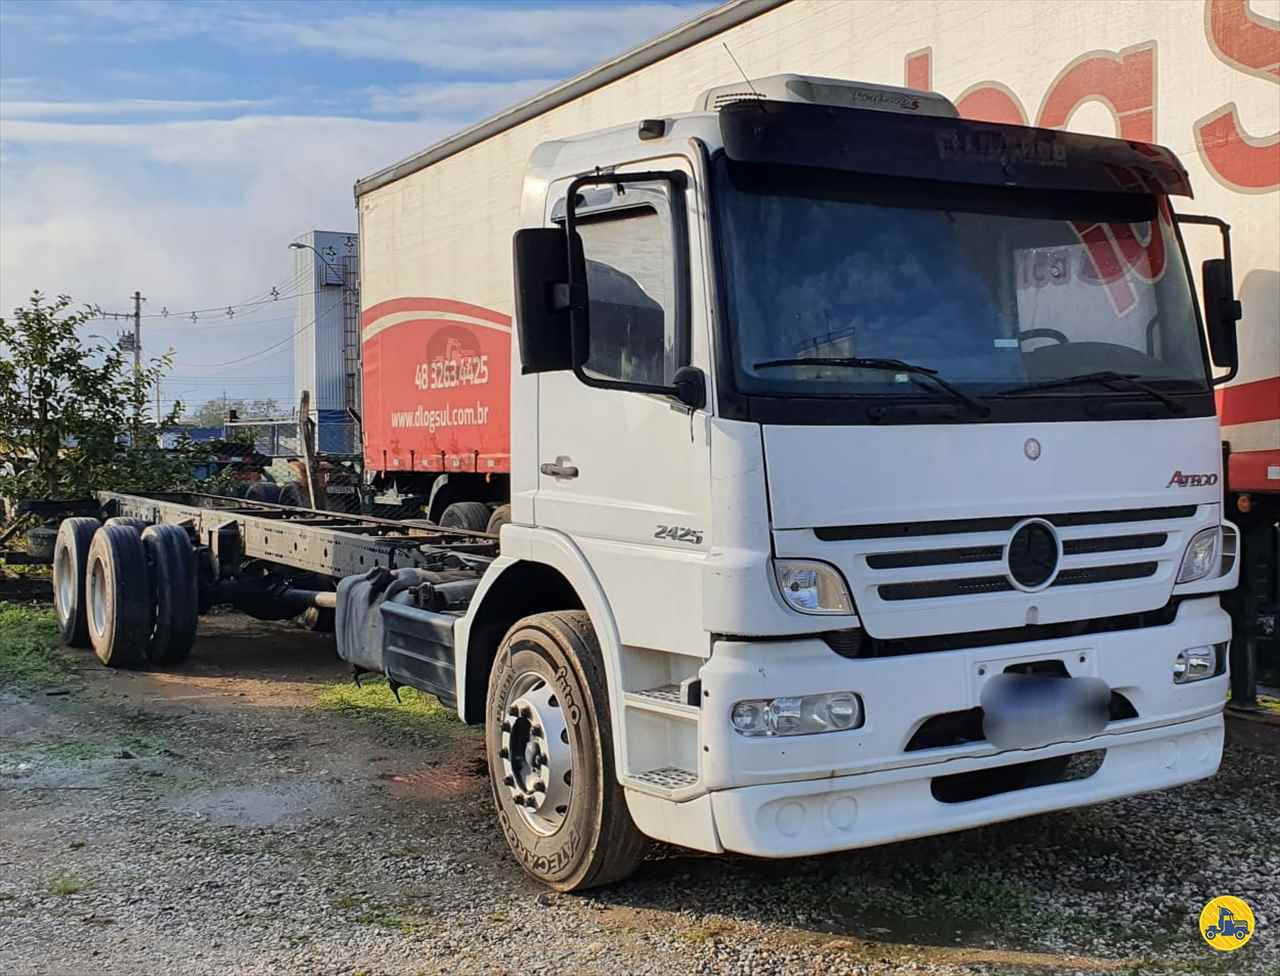 MB 2425 de Trevo Caminhões - AGB - ITAJAI/SC